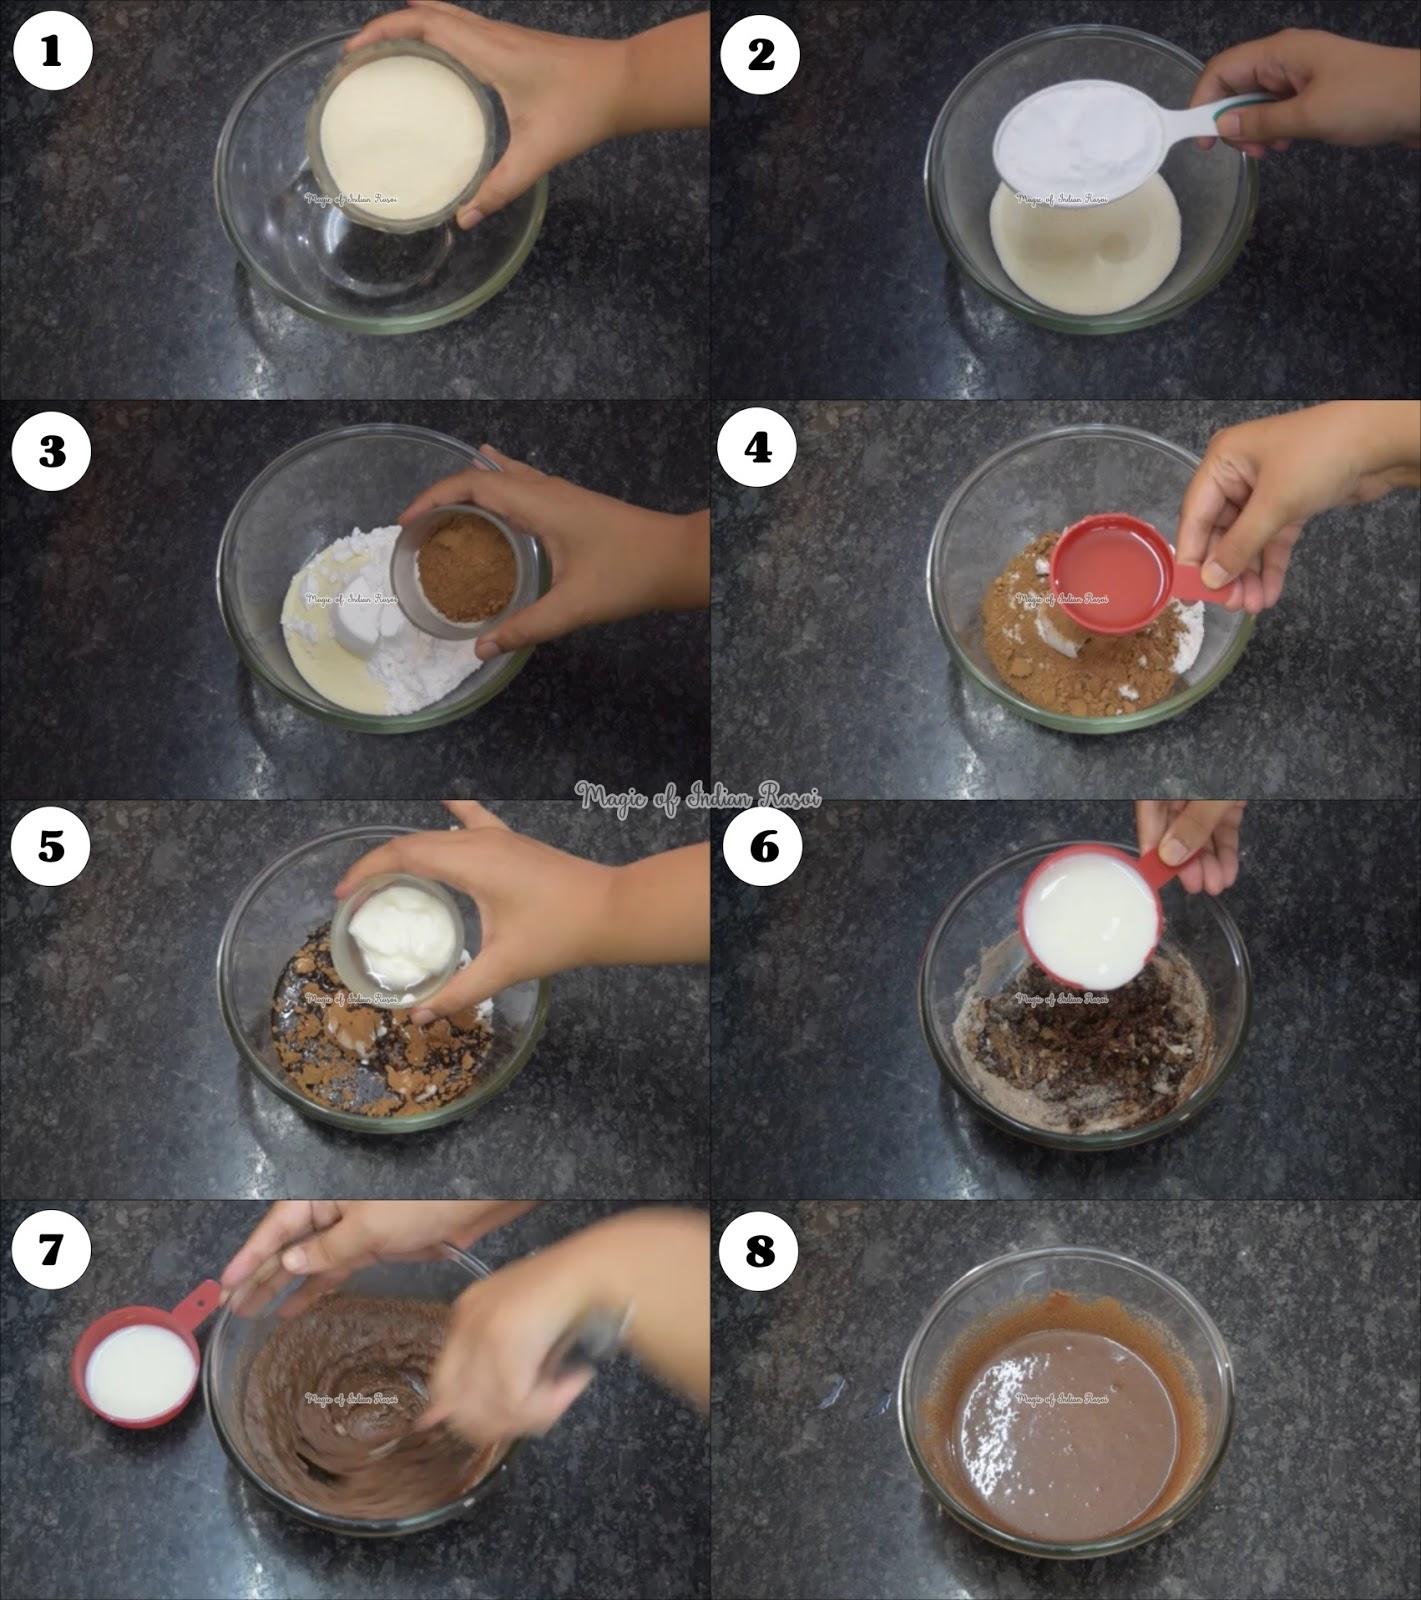 Chocolate Rava Cake Recipe (Bakery Style) - चॉकलेट रवा केक रेसिपी - Priya R - Magic of Indian Rasoi